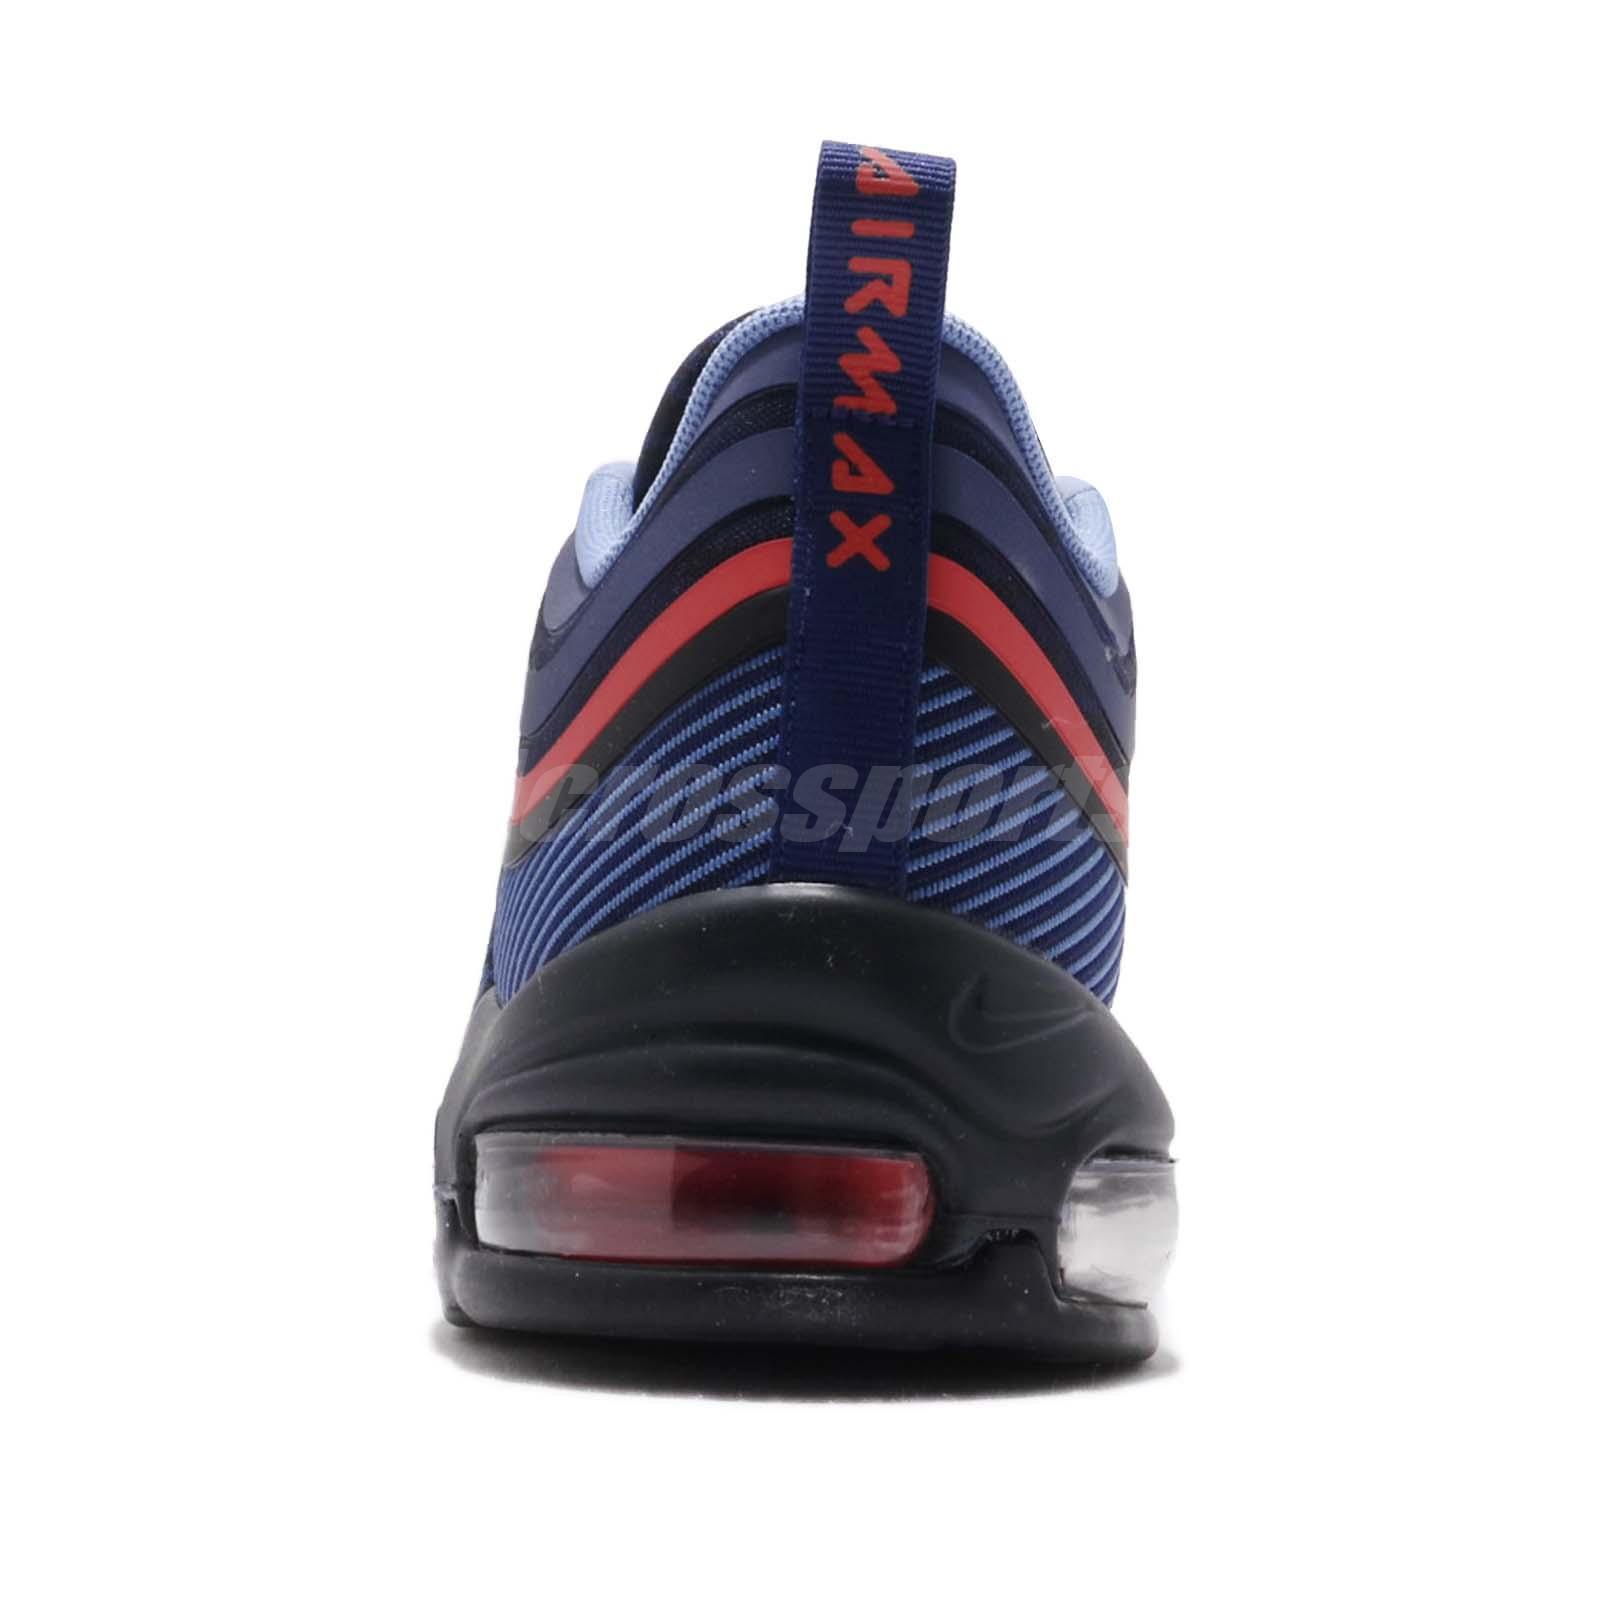 Nike Air Max 97 Menta Grailed